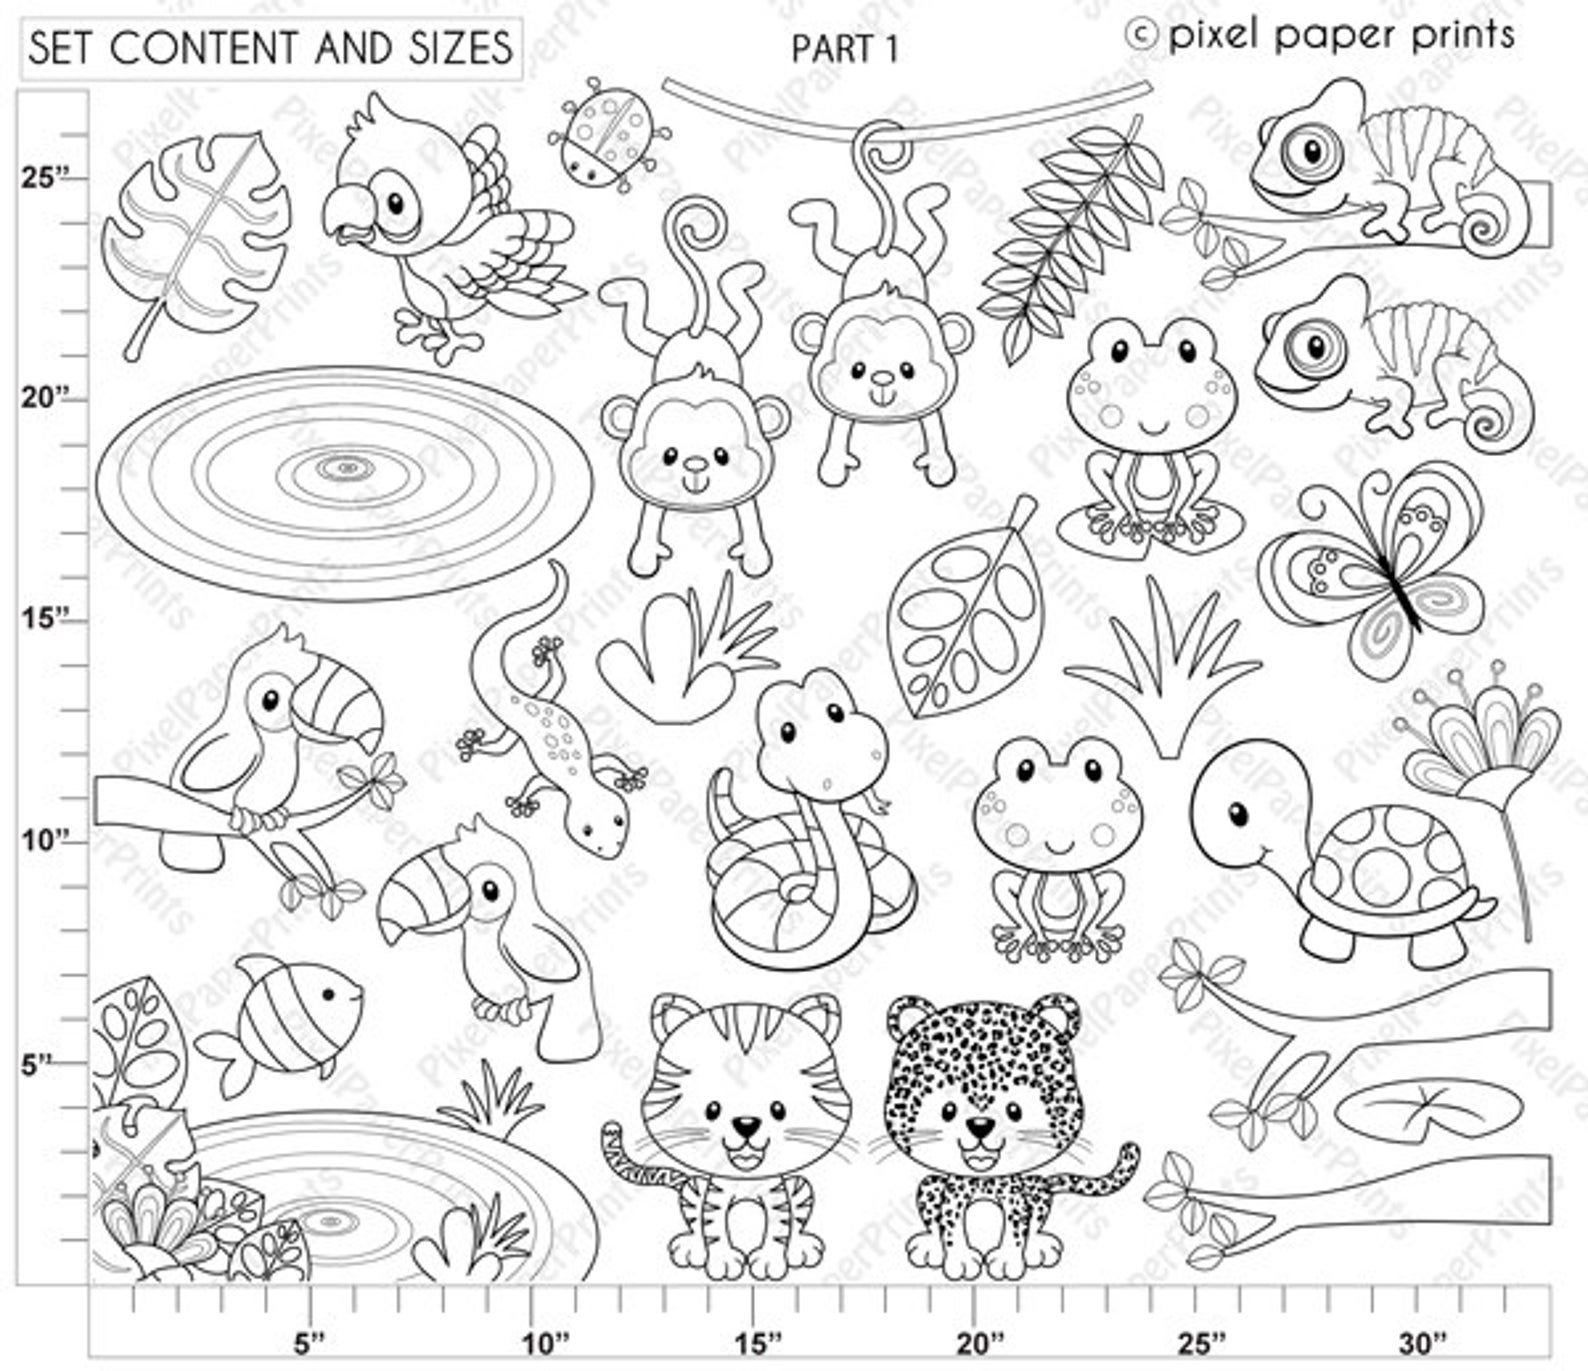 Rainforest Animals Digital Stamps Clipart Etsy Digital Stamps Rainforest Animals Coloring Pages